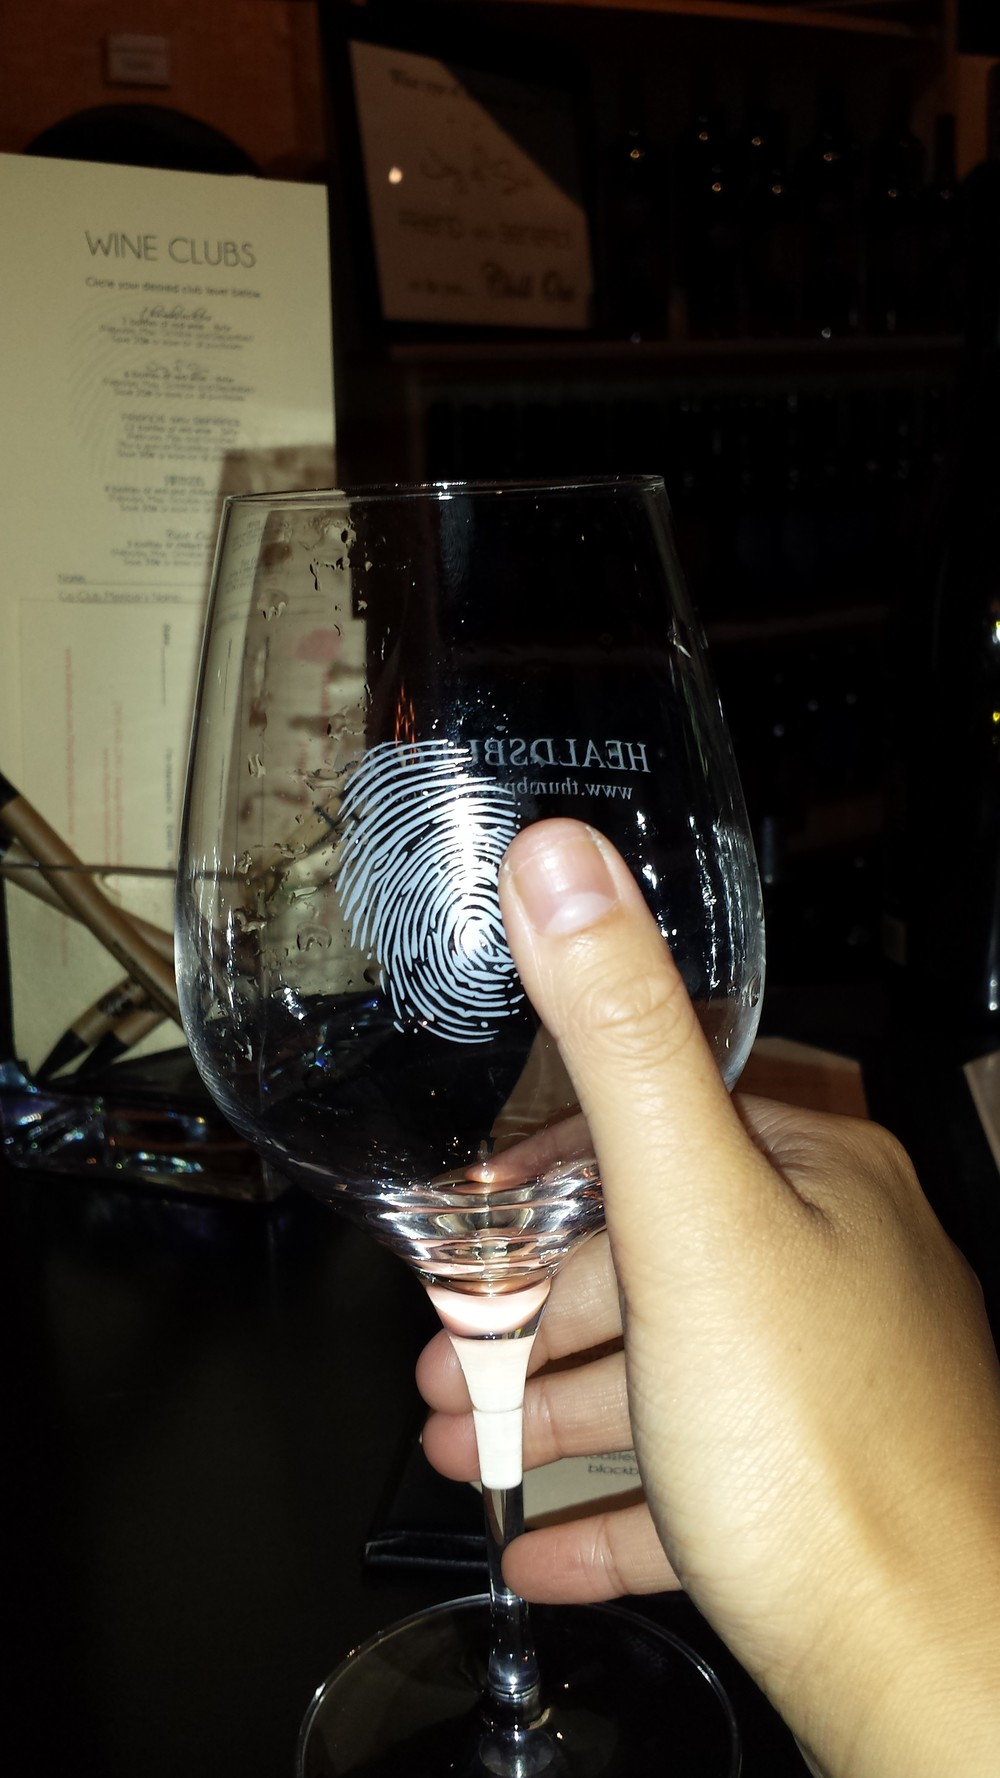 Thumbprint. Tehehe. Really liked the cute thumbprint glass.